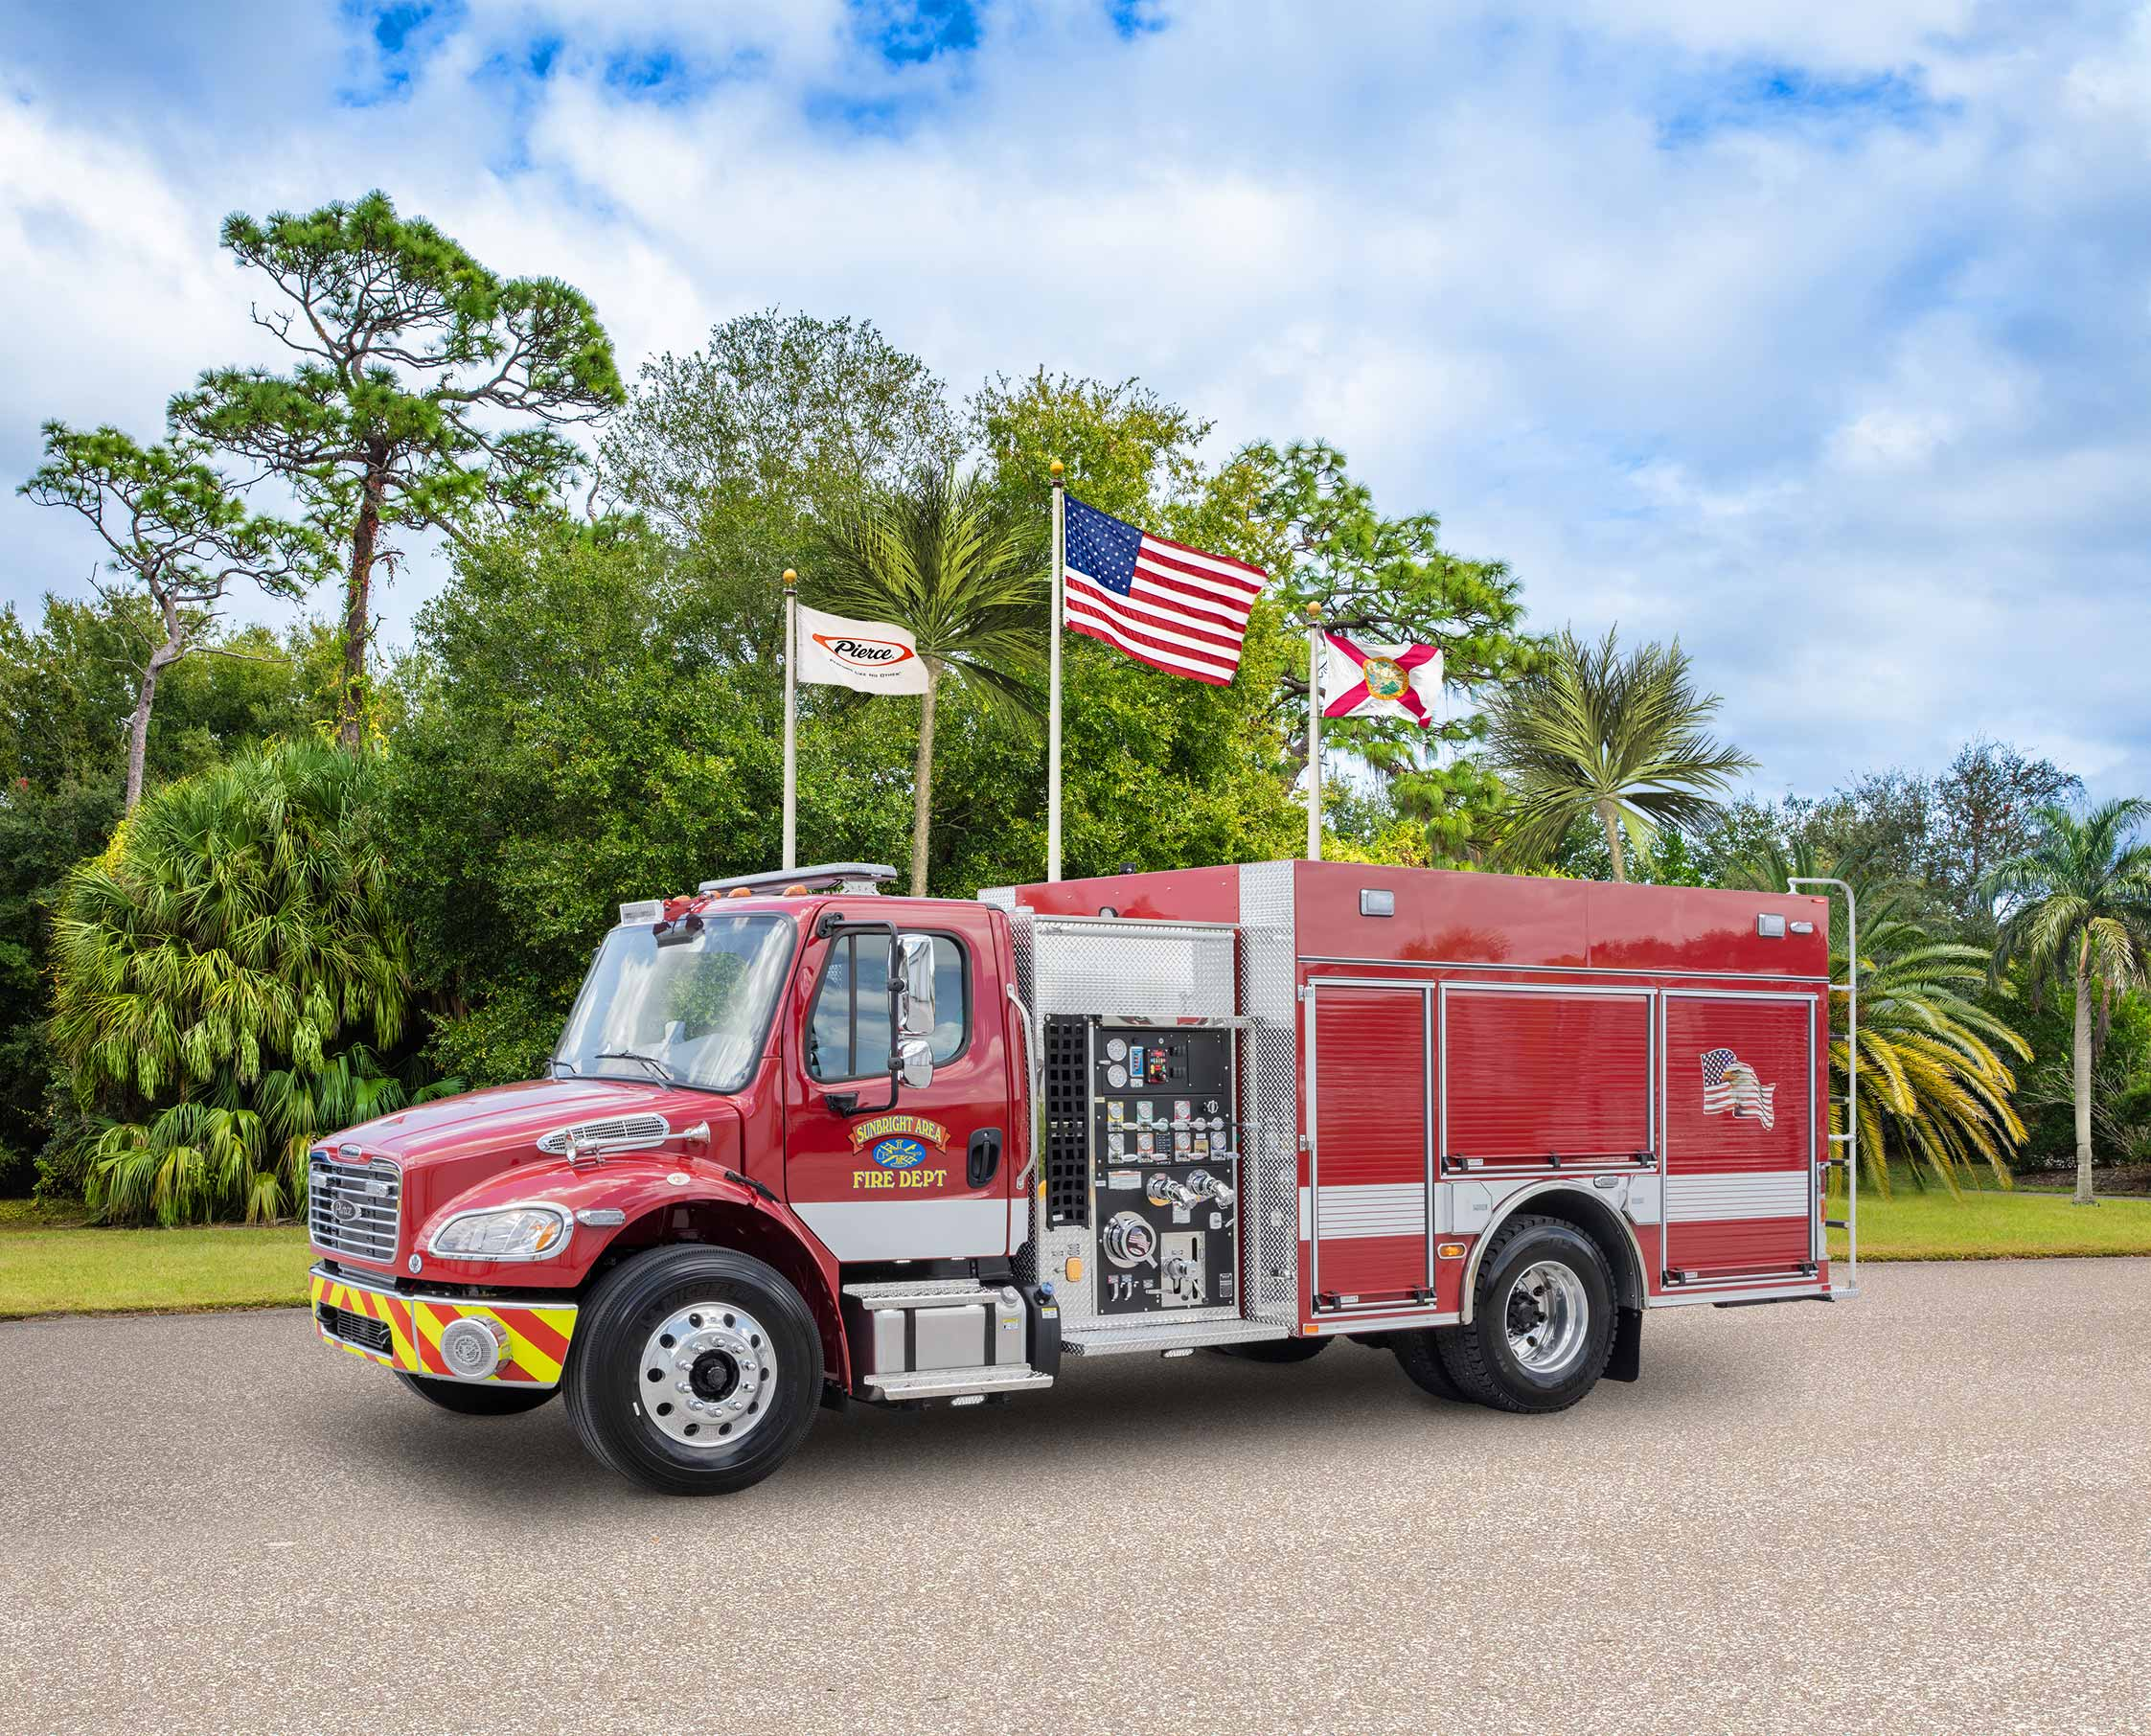 Sunbright Volunteer Fire Department - Pumper